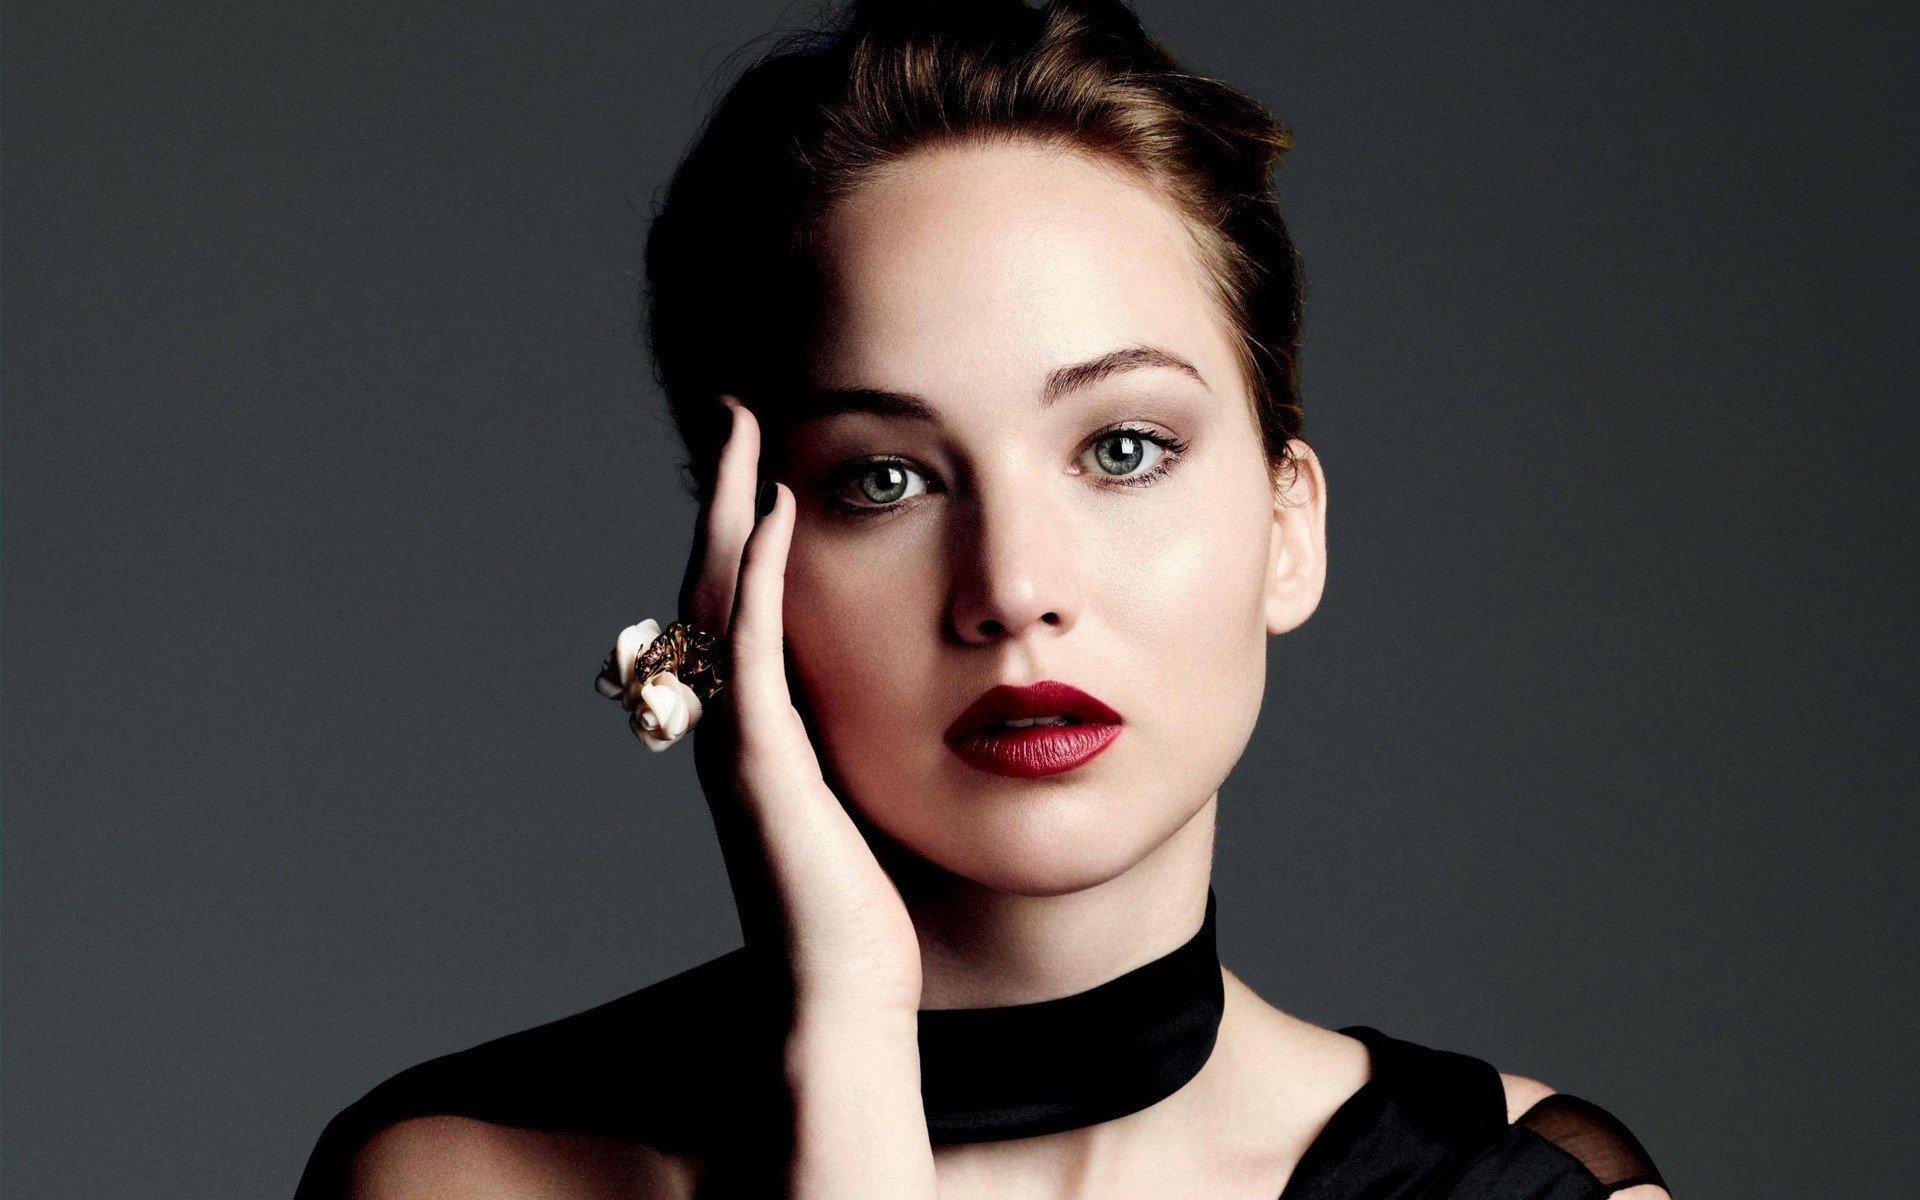 Fondo de pantalla de Jennifer Lawrence maquillada Imágenes